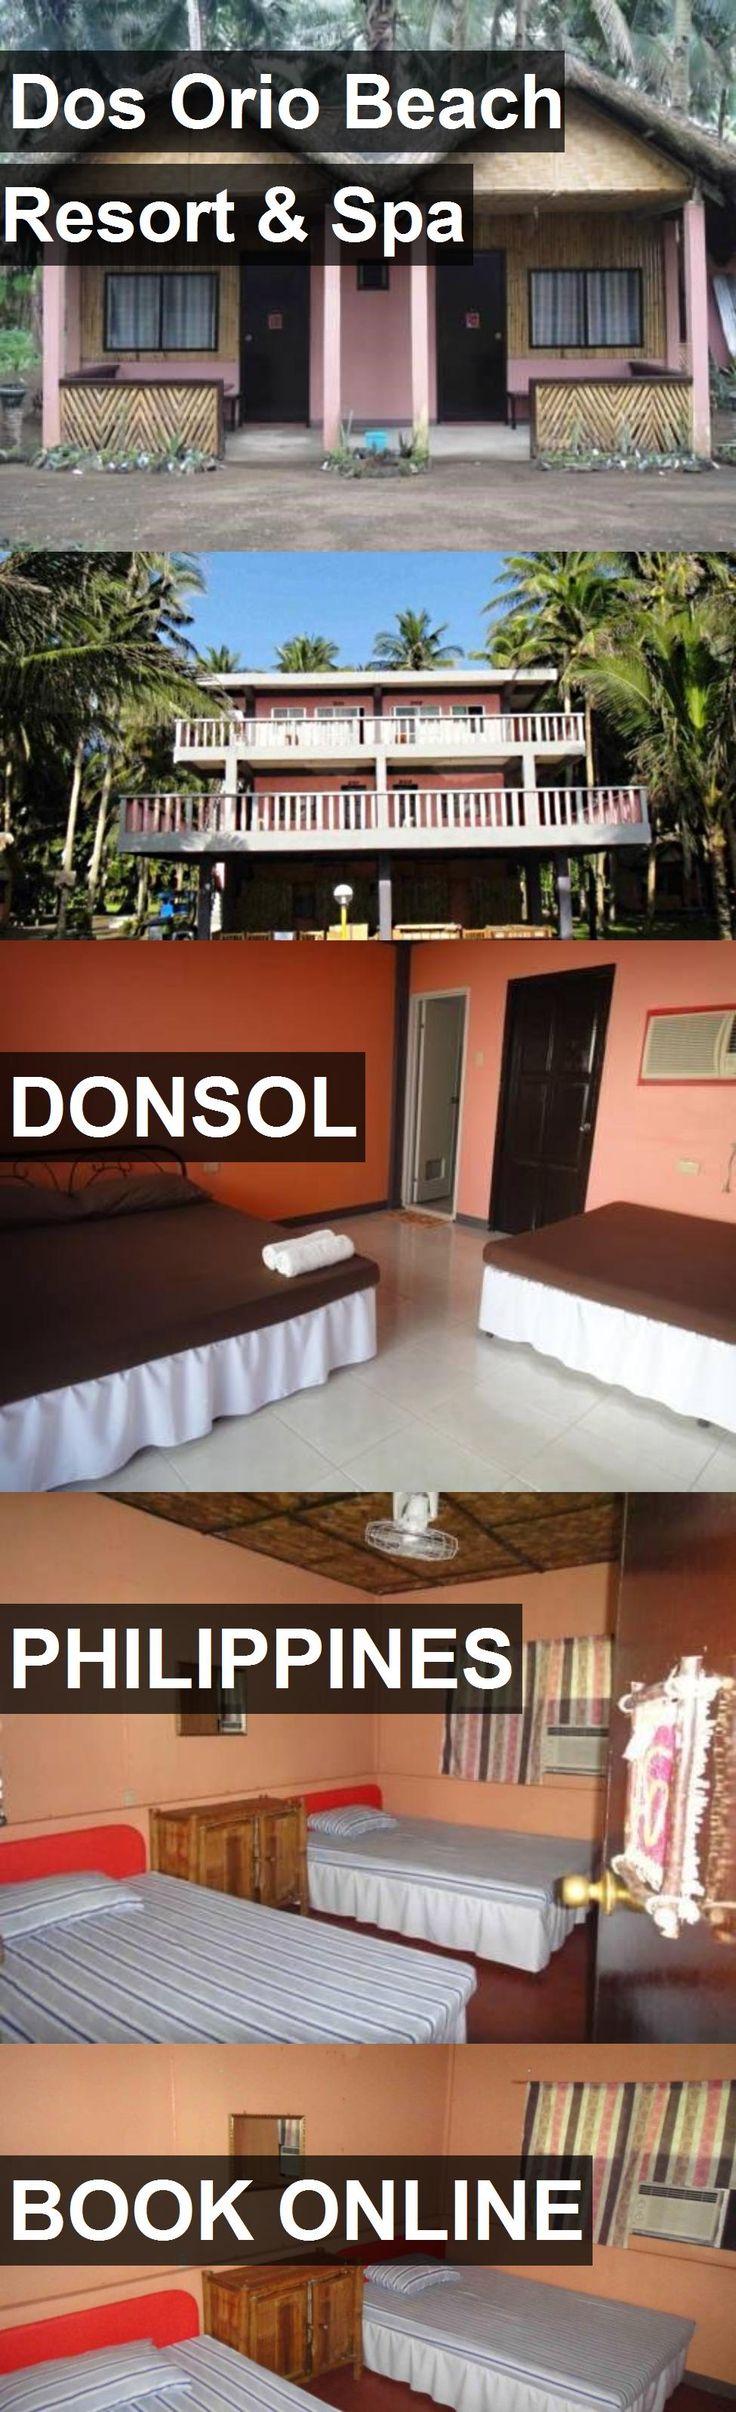 Hotel Dos Orio Beach Resort